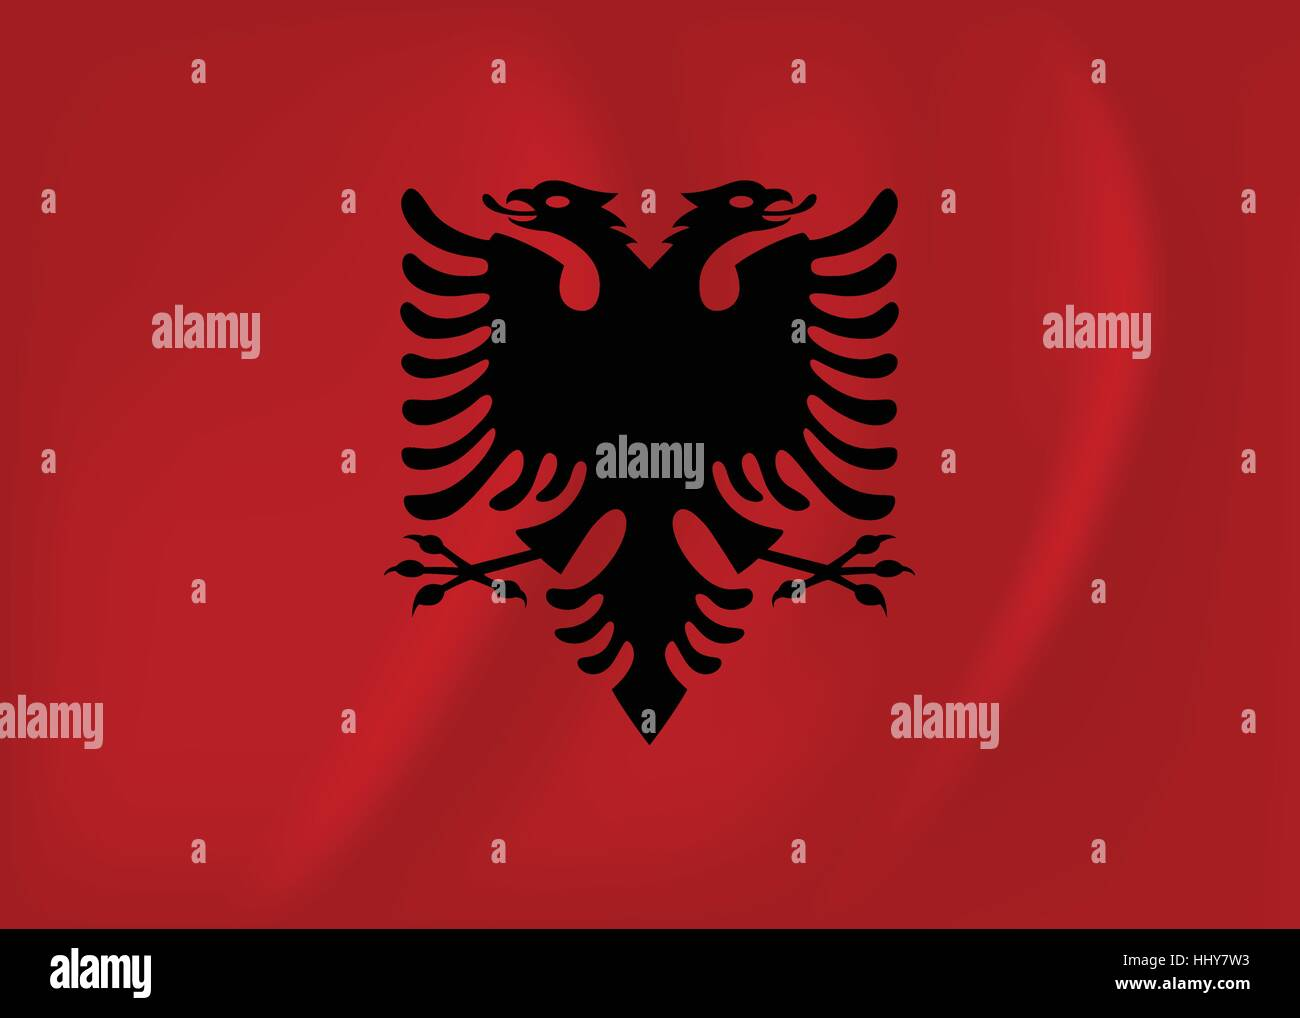 Vector image of the Albania waving flag - Stock Image